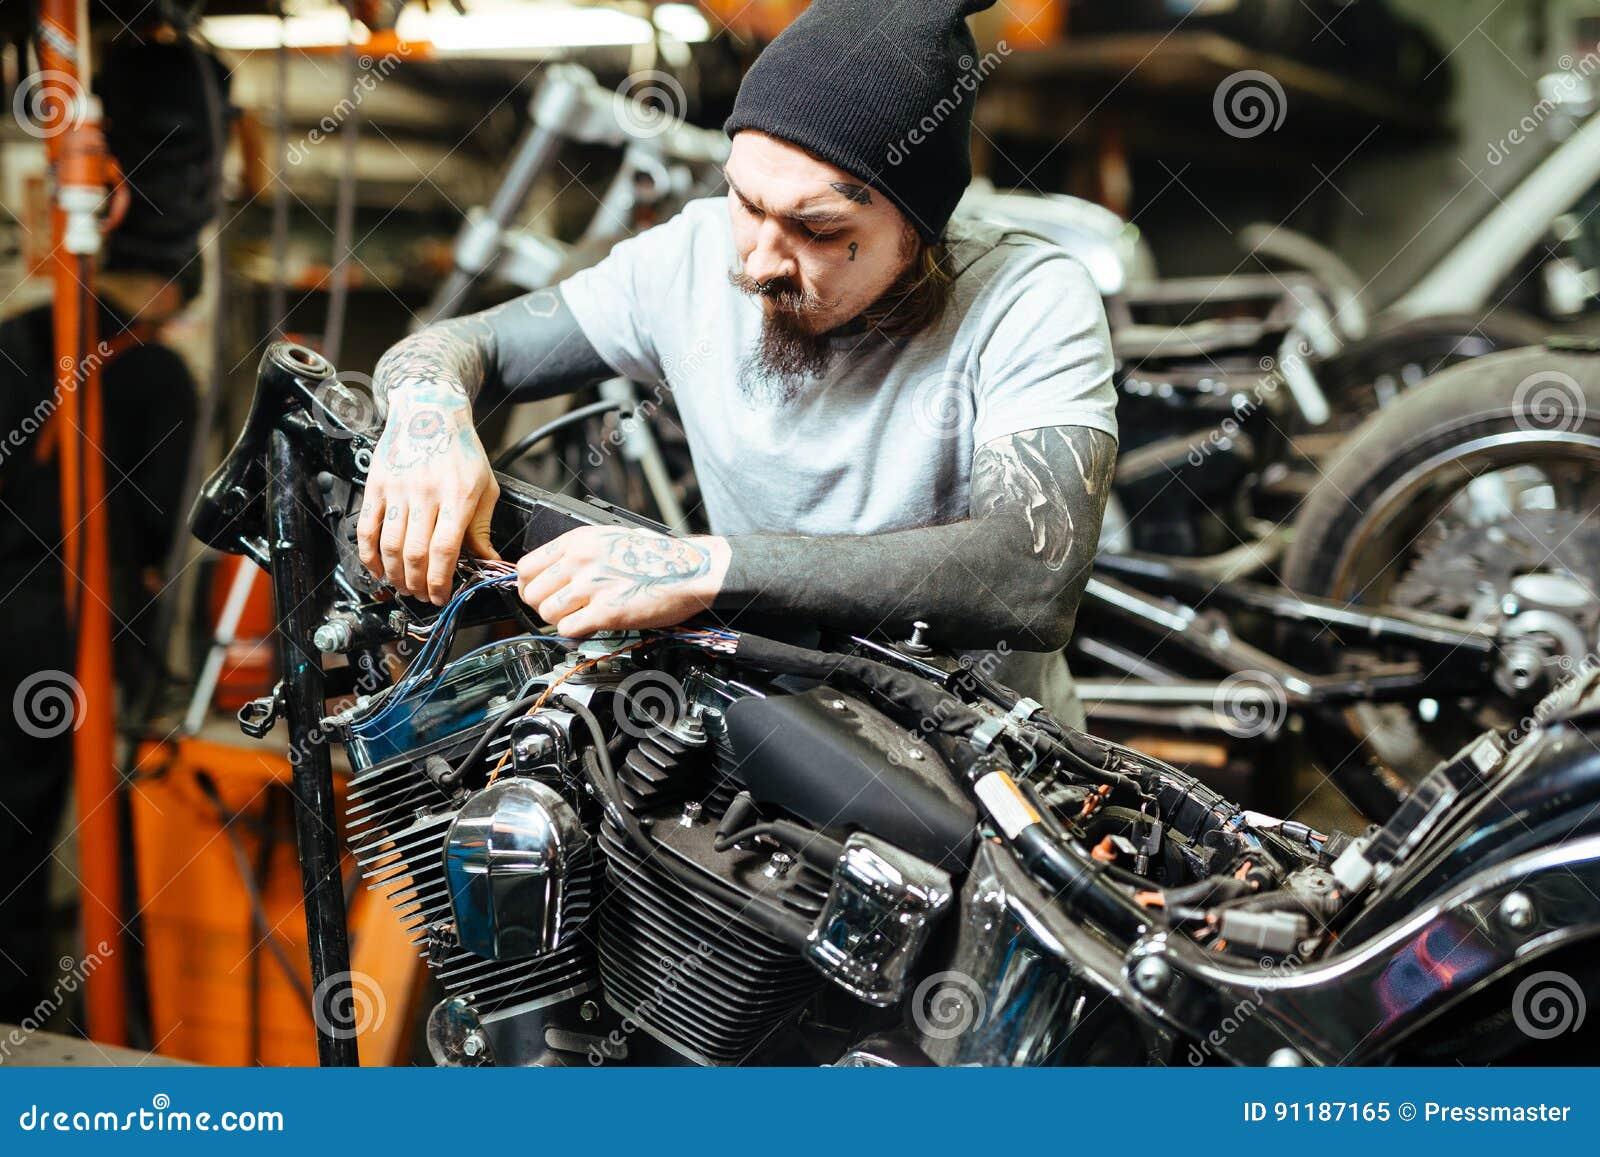 motard tatou brutal adaptant la moto aux besoins du client image stock image du personnaliser. Black Bedroom Furniture Sets. Home Design Ideas